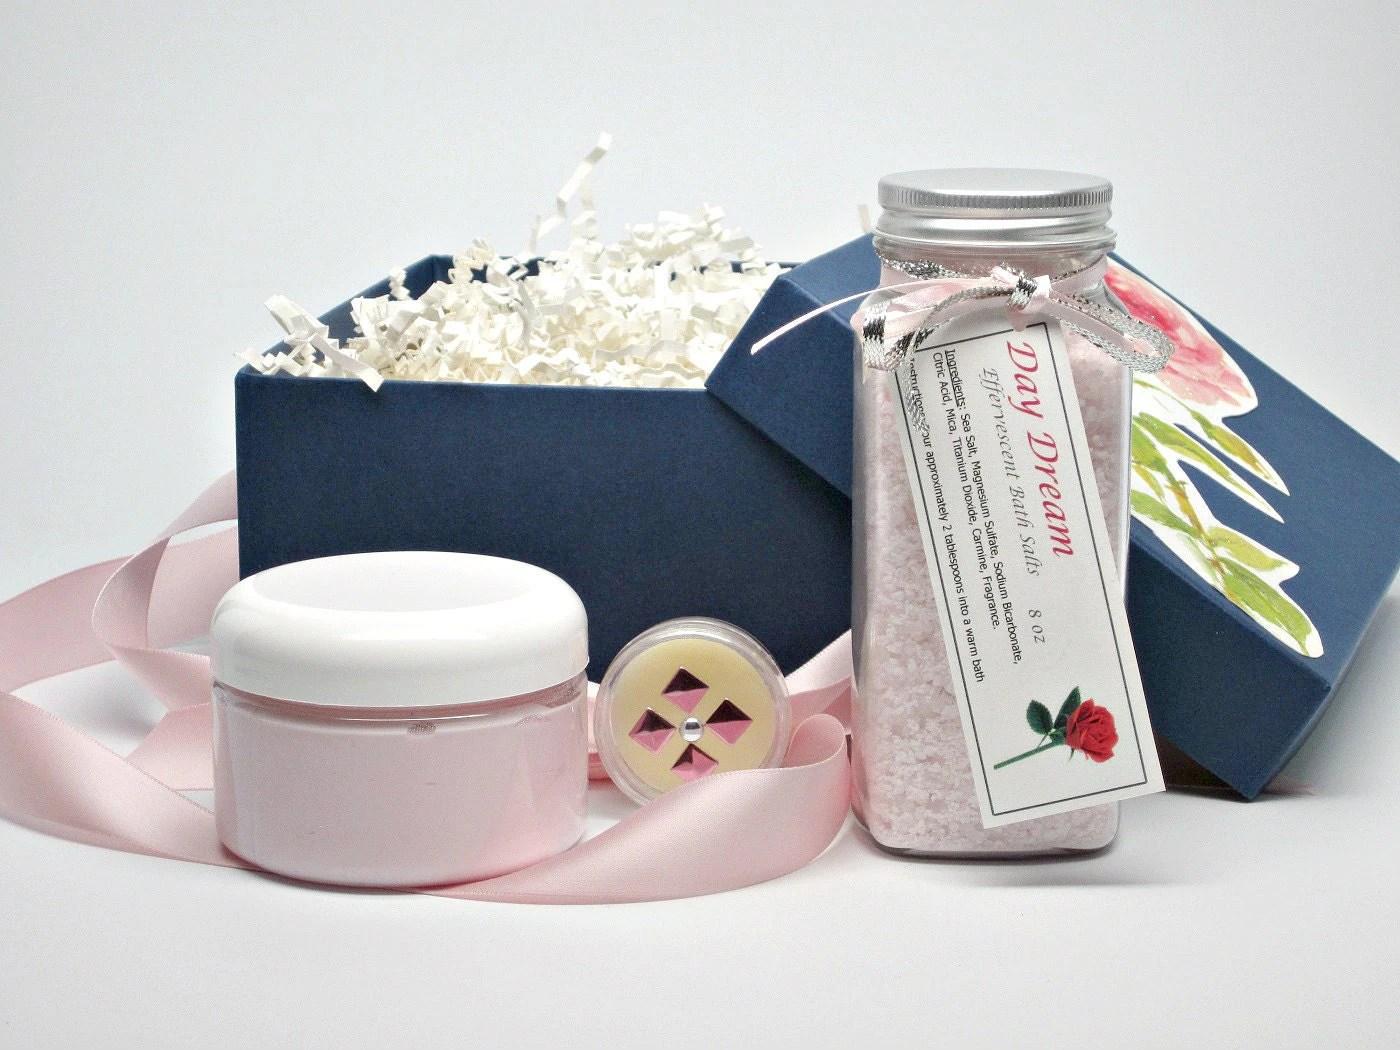 Romantic Bath And Body Gift Set Spa Gift Basket Women's